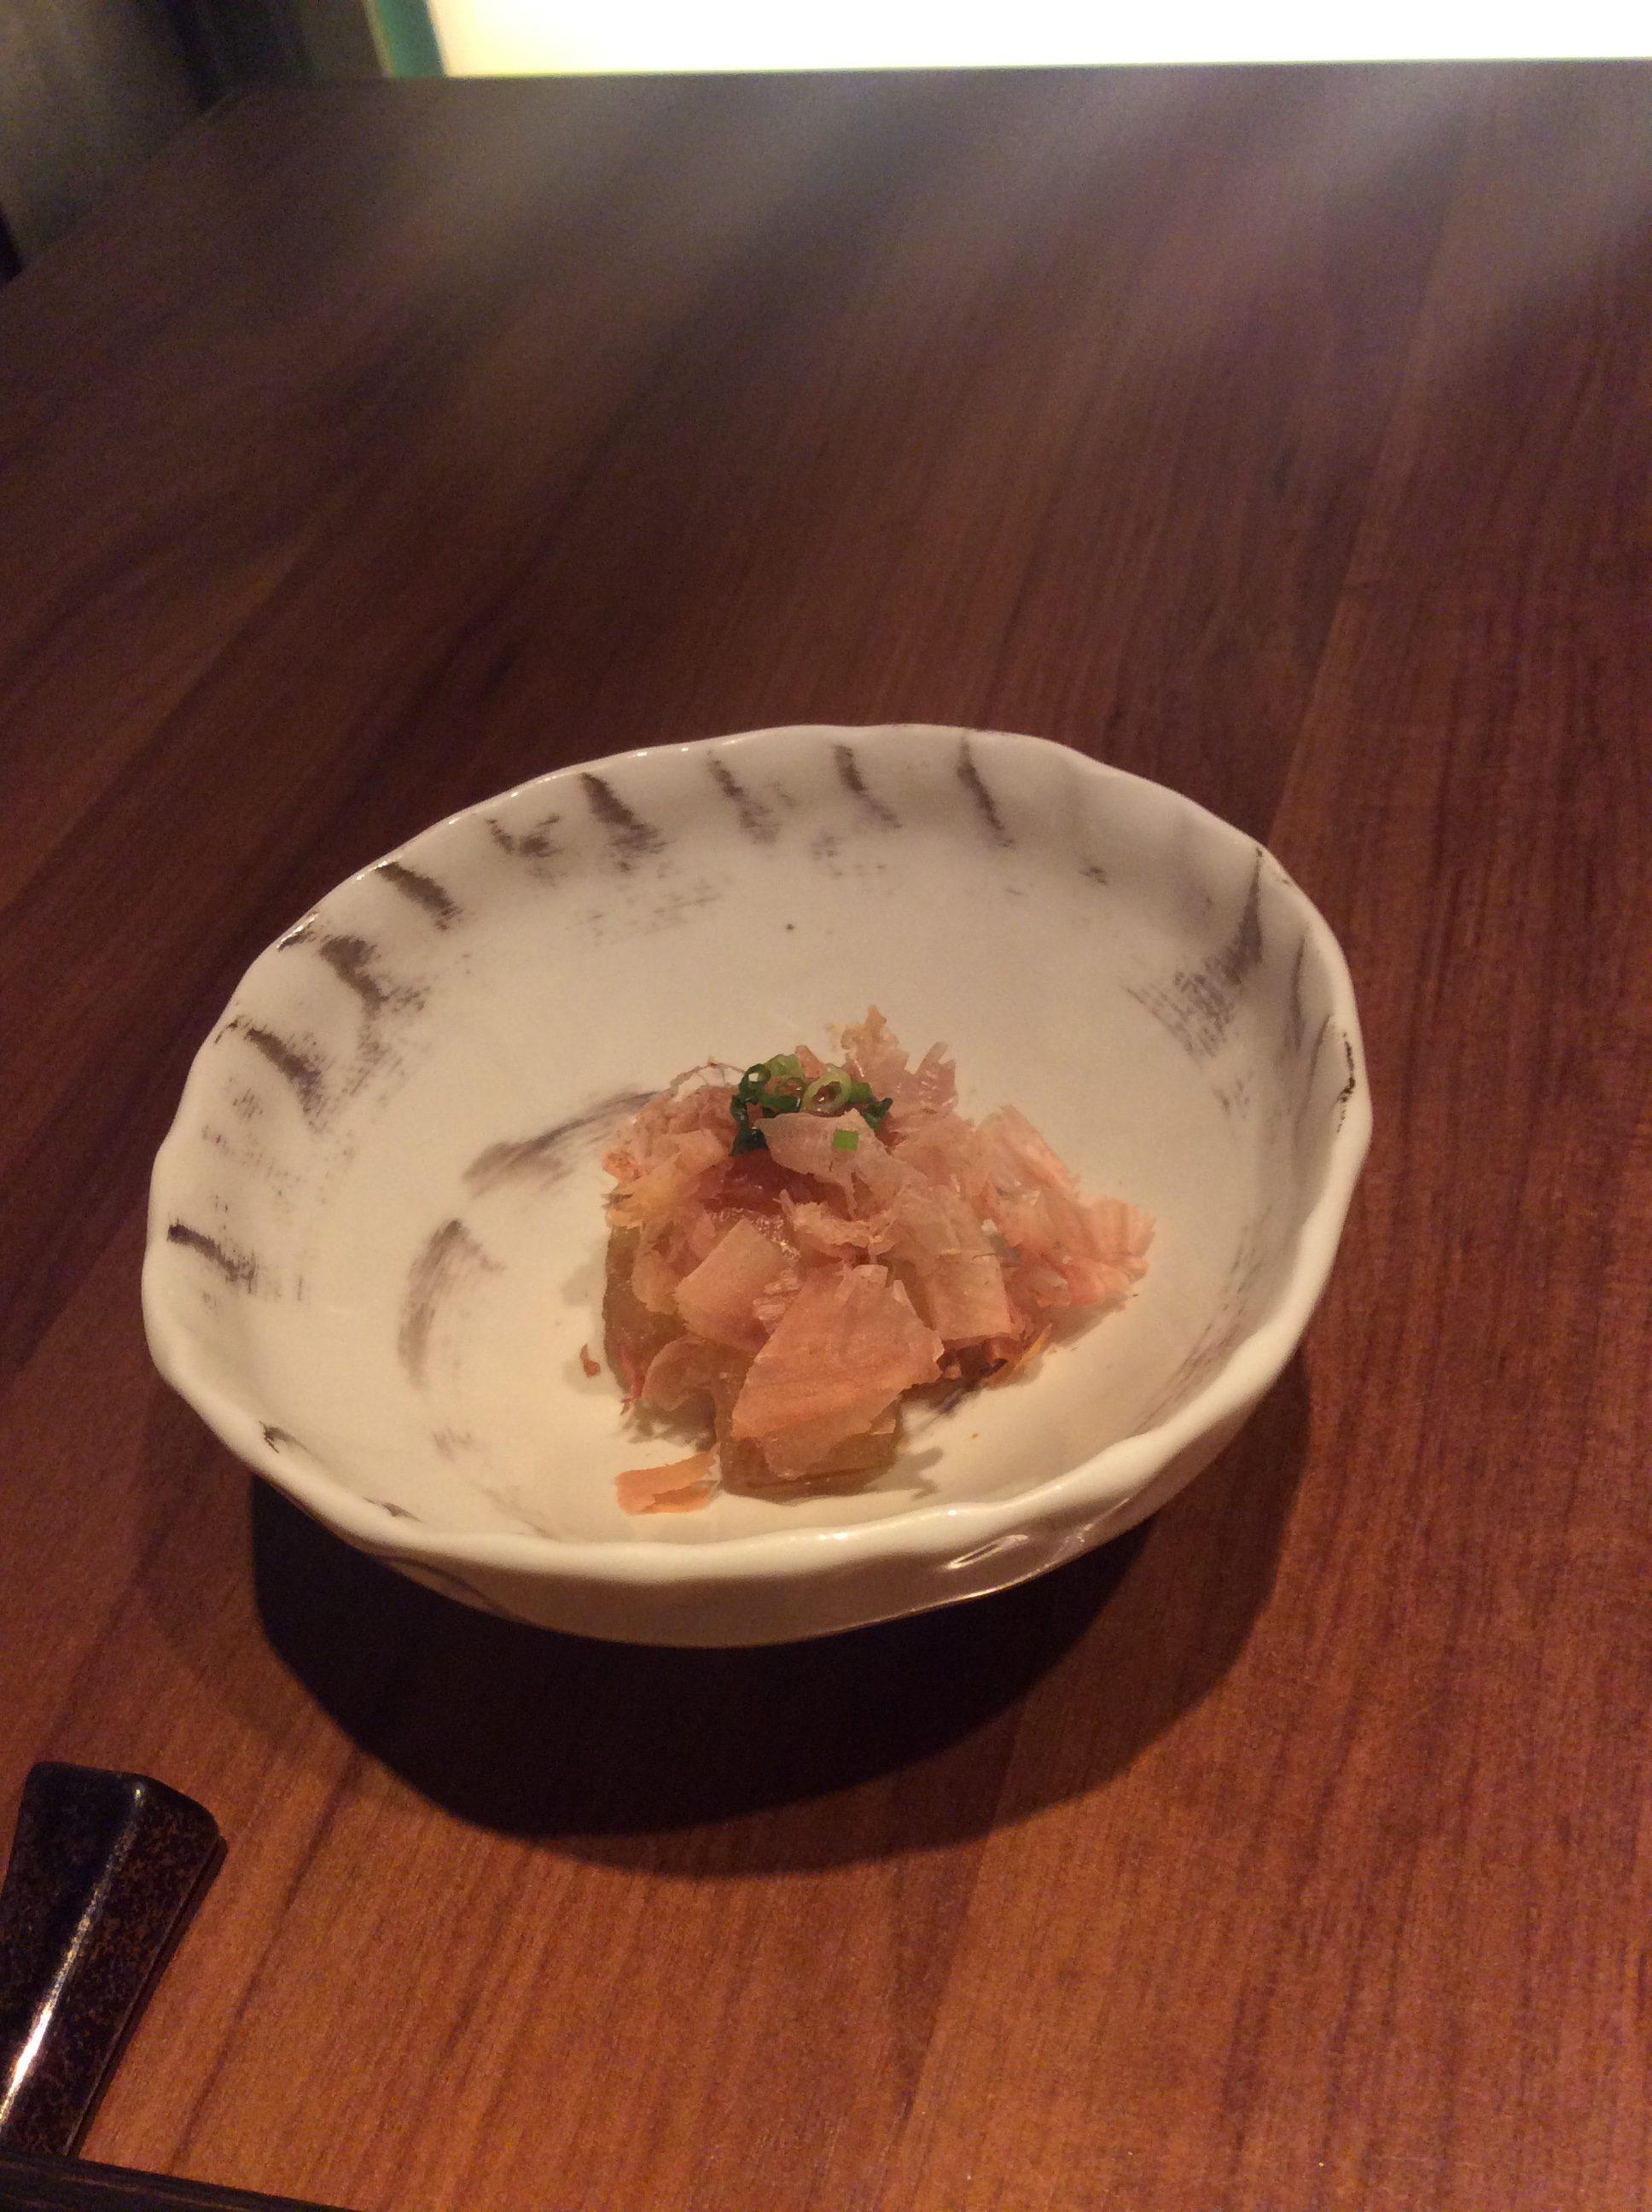 A5ランク黒毛和牛ステーキが味わえる円居 -MADOy- 横浜関内